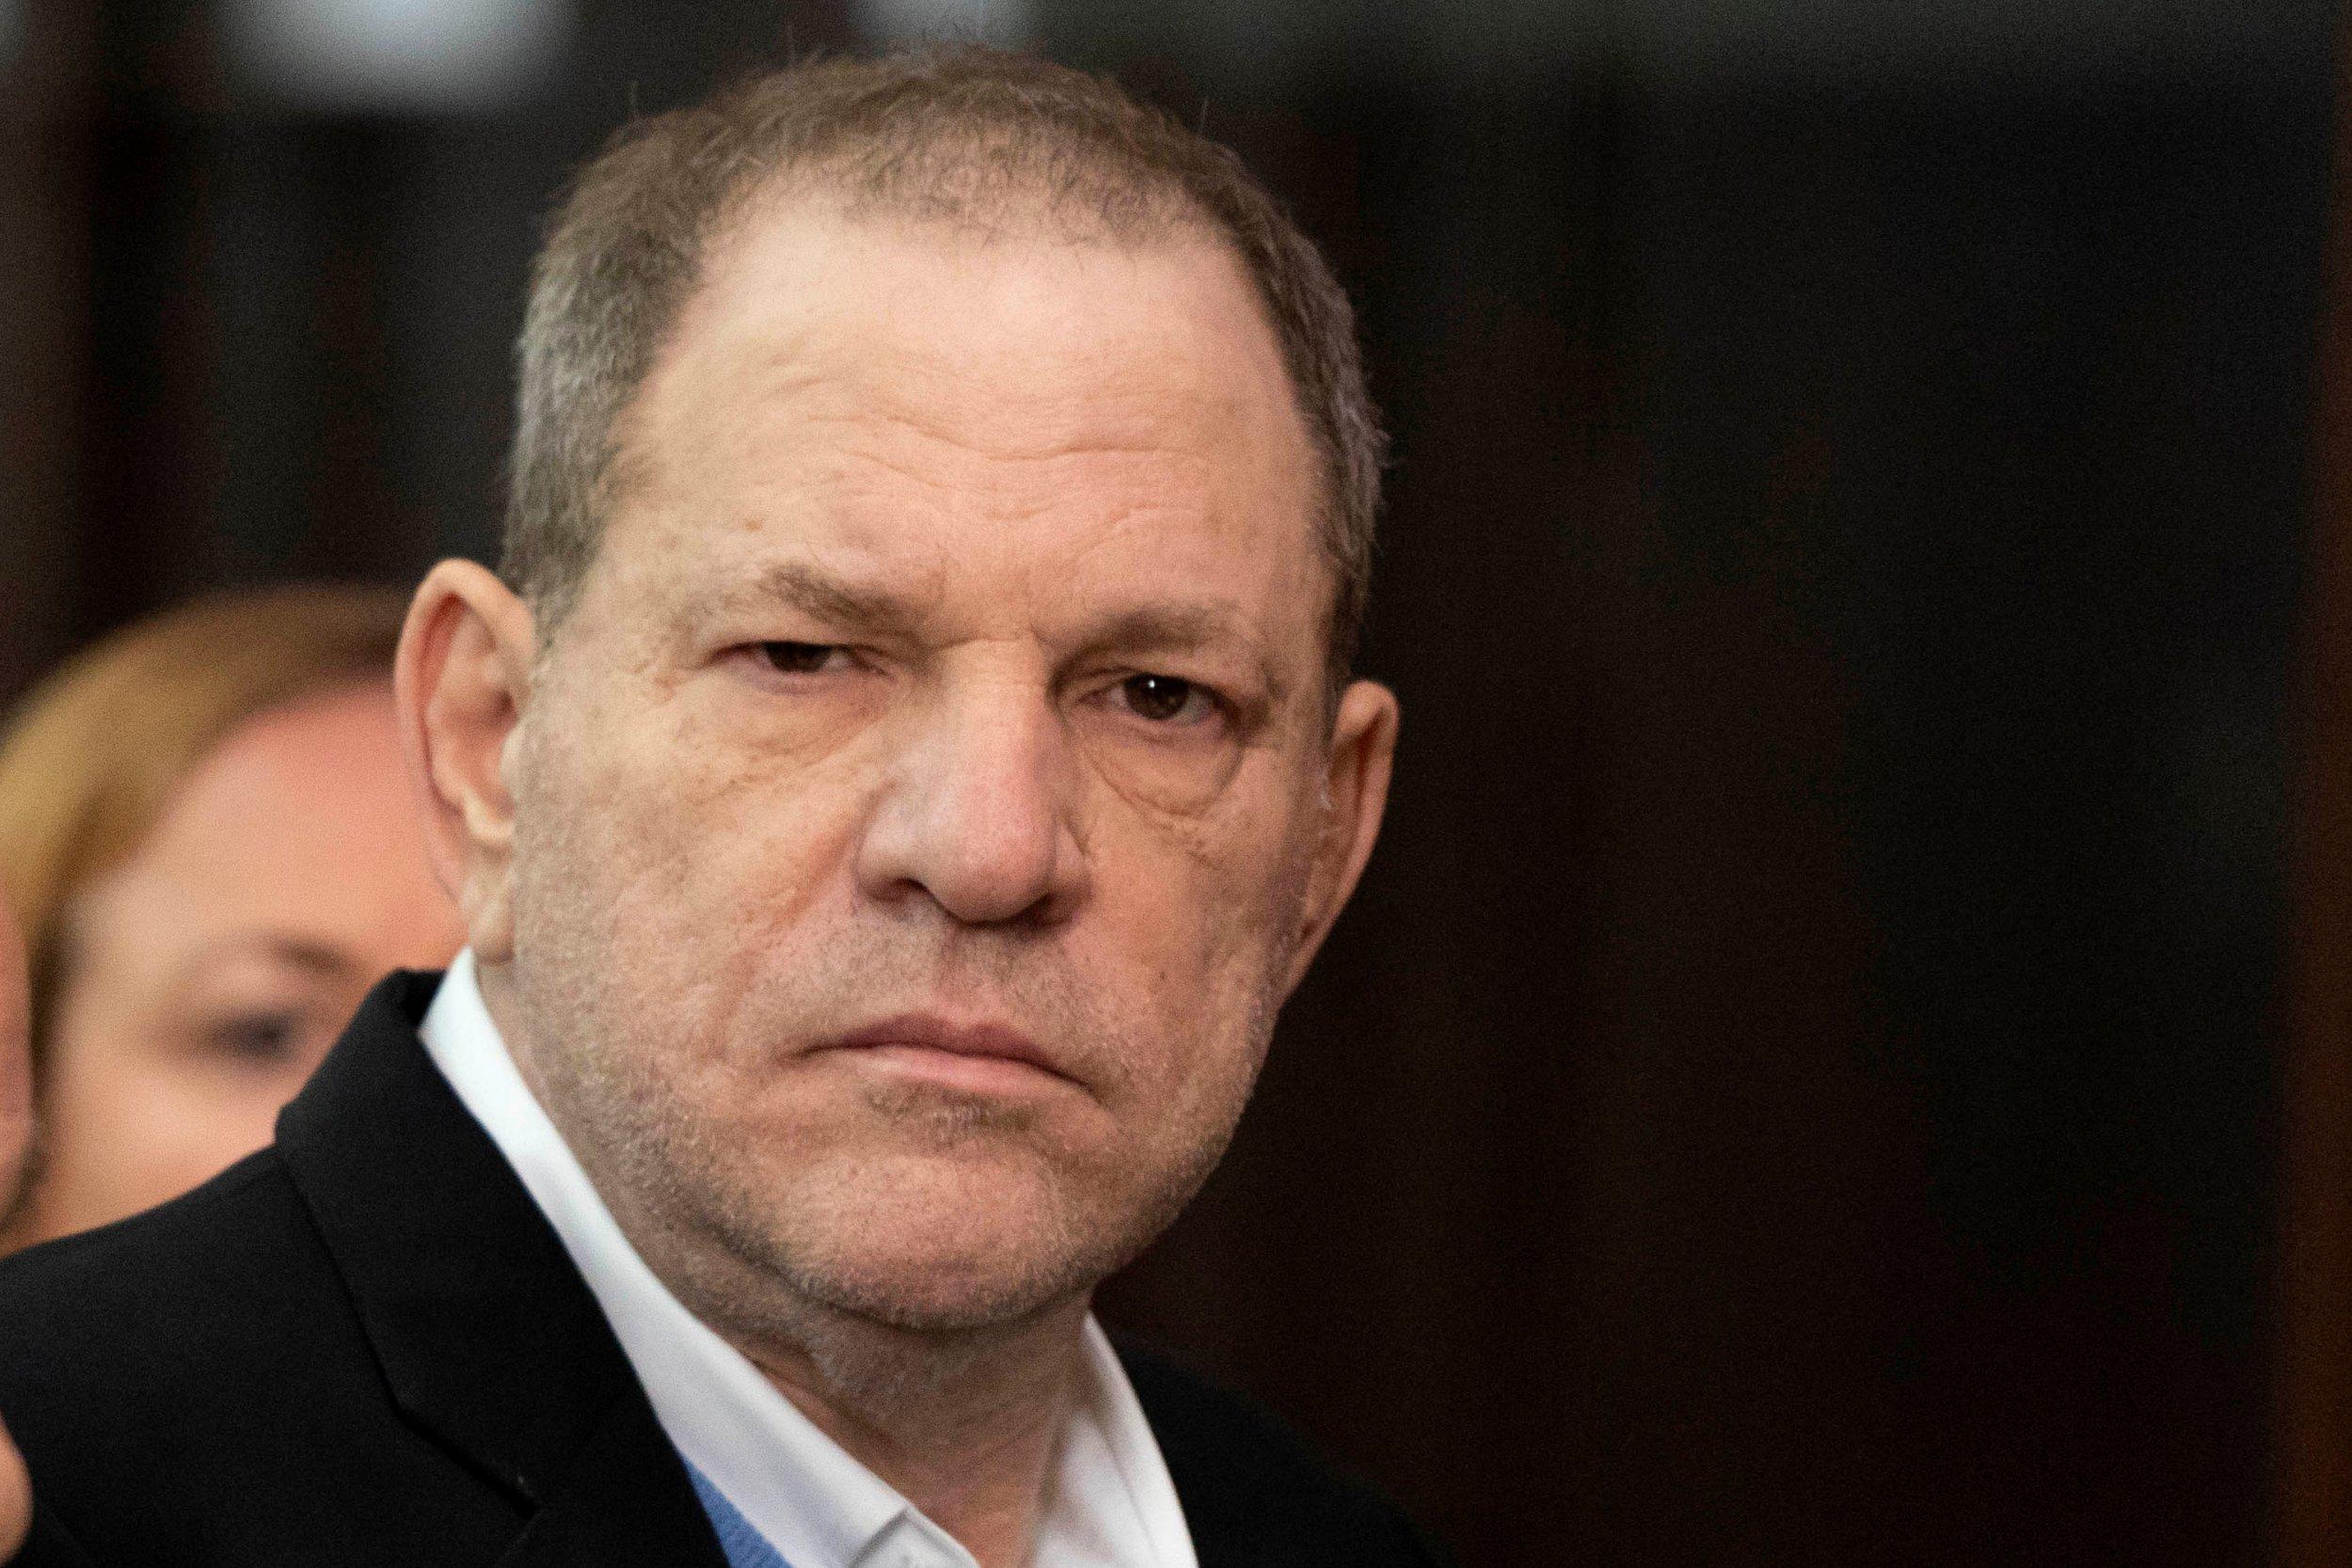 Film producer Harvey Weinstein stands inside Manhattan Criminal Court during his arraignment in Manhattan in New York, U.S., May 25, 2018. Steven Hirsch/Pool via REUTERS